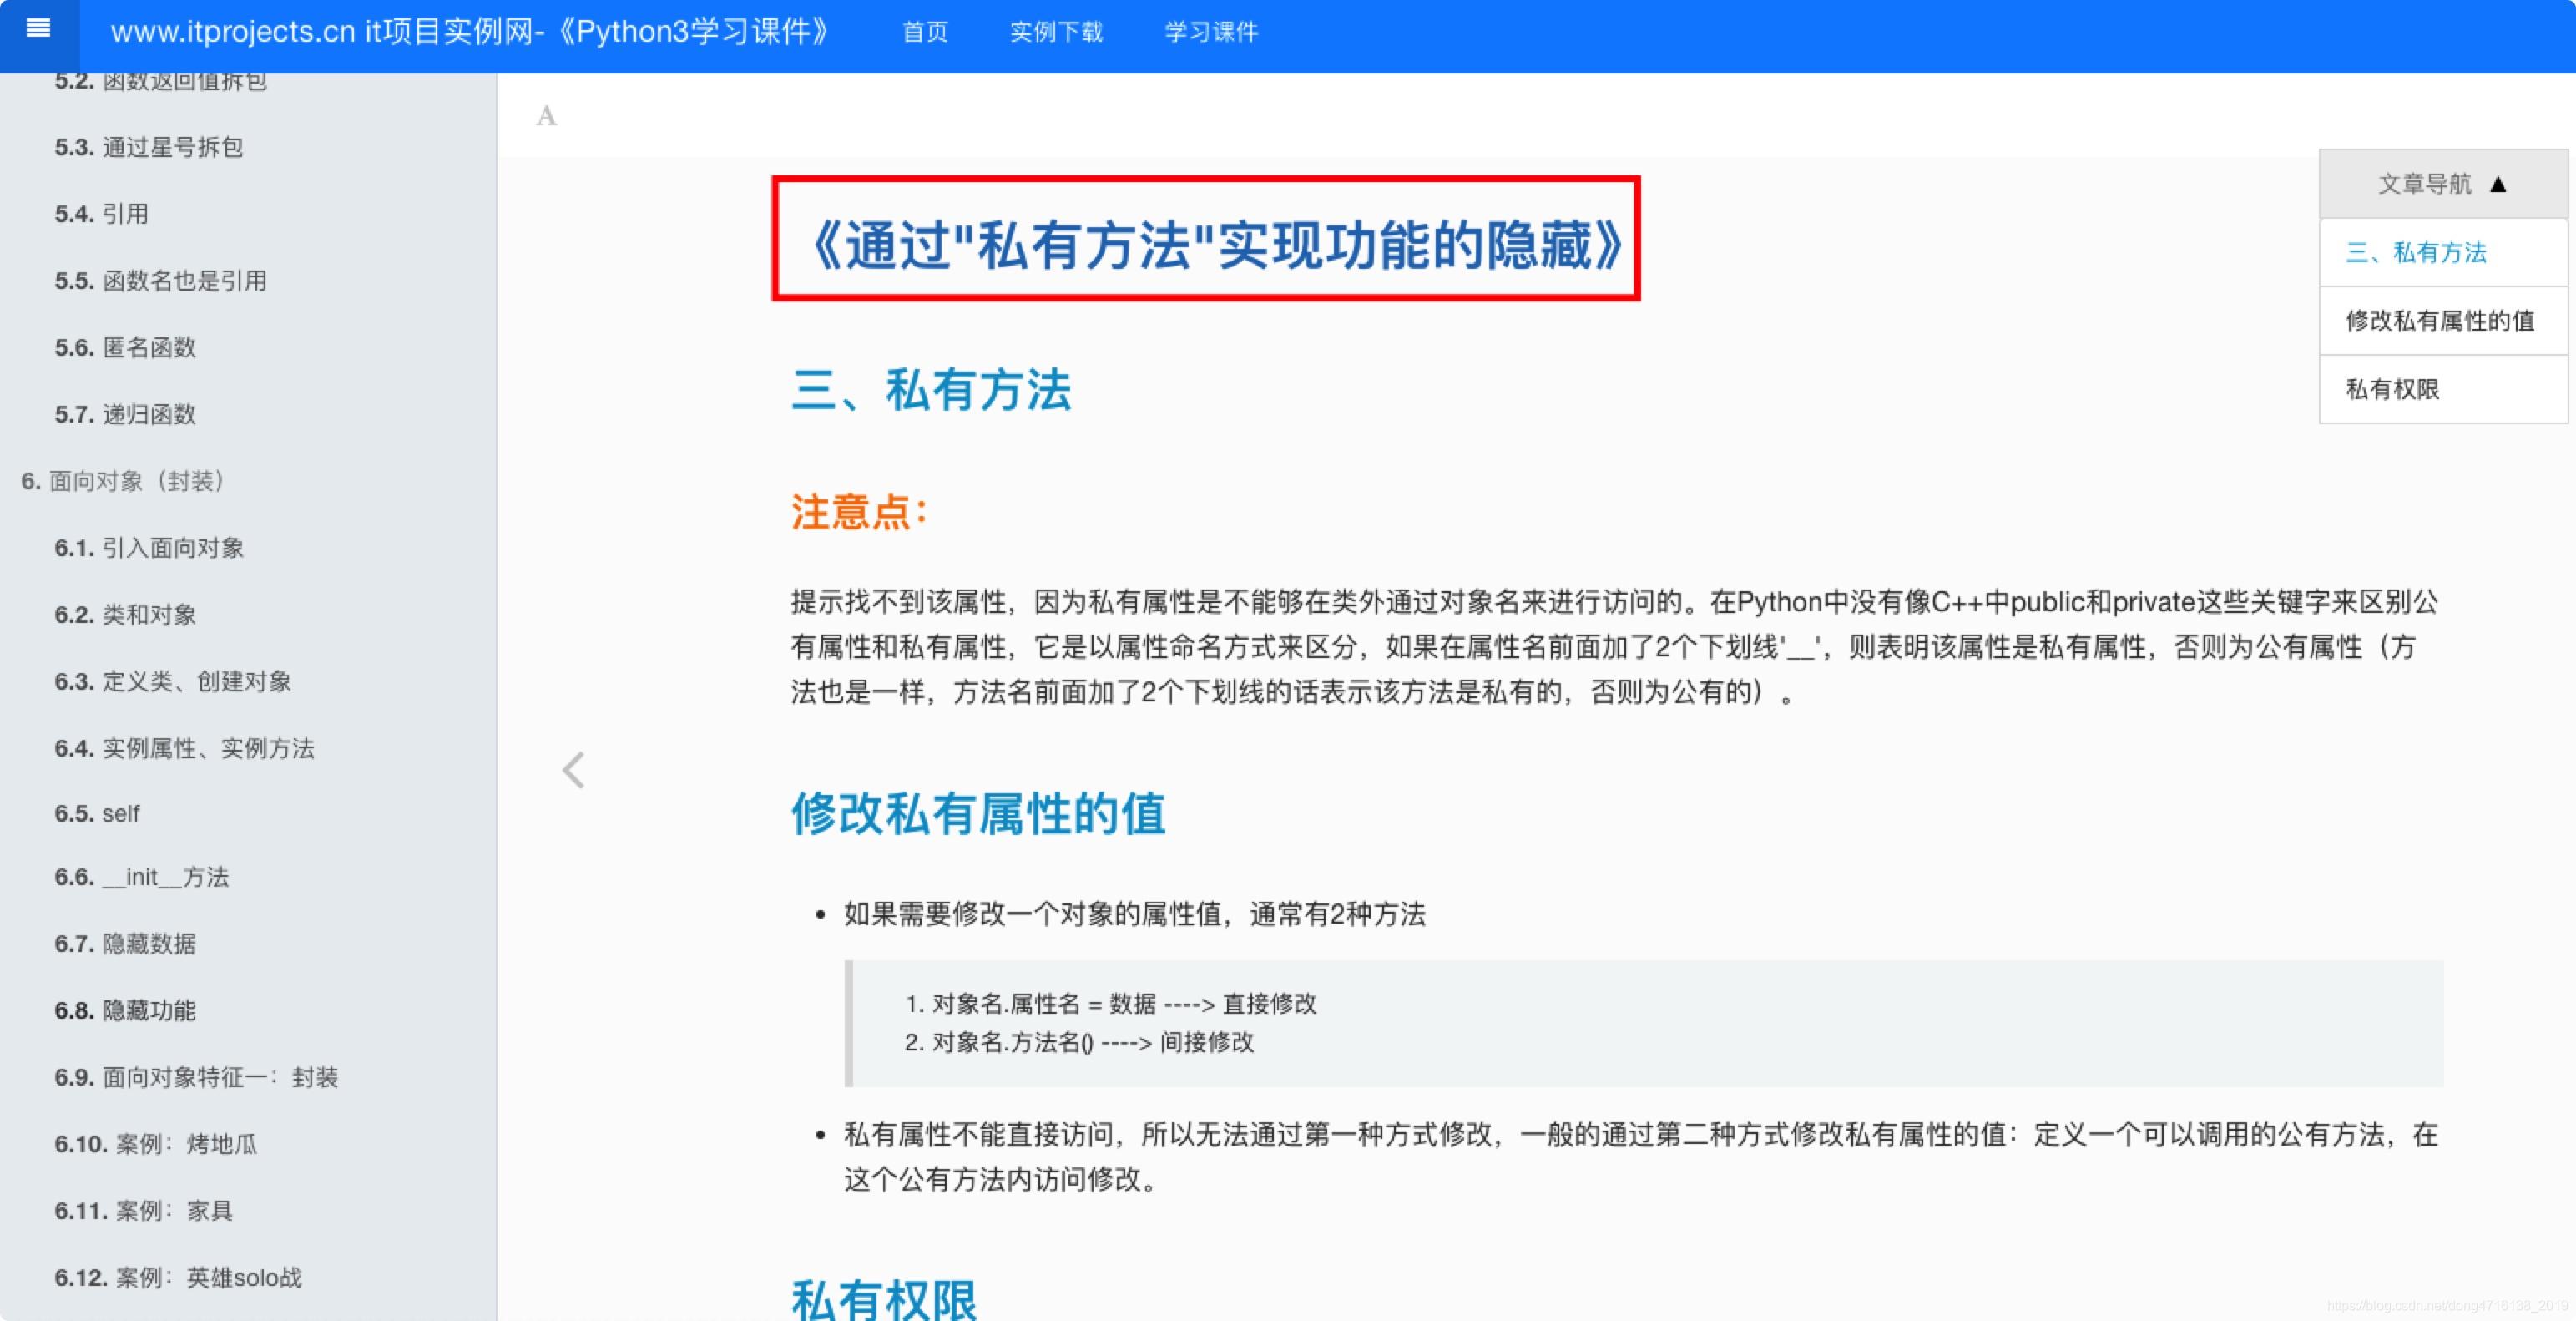 www.itprojects.cn